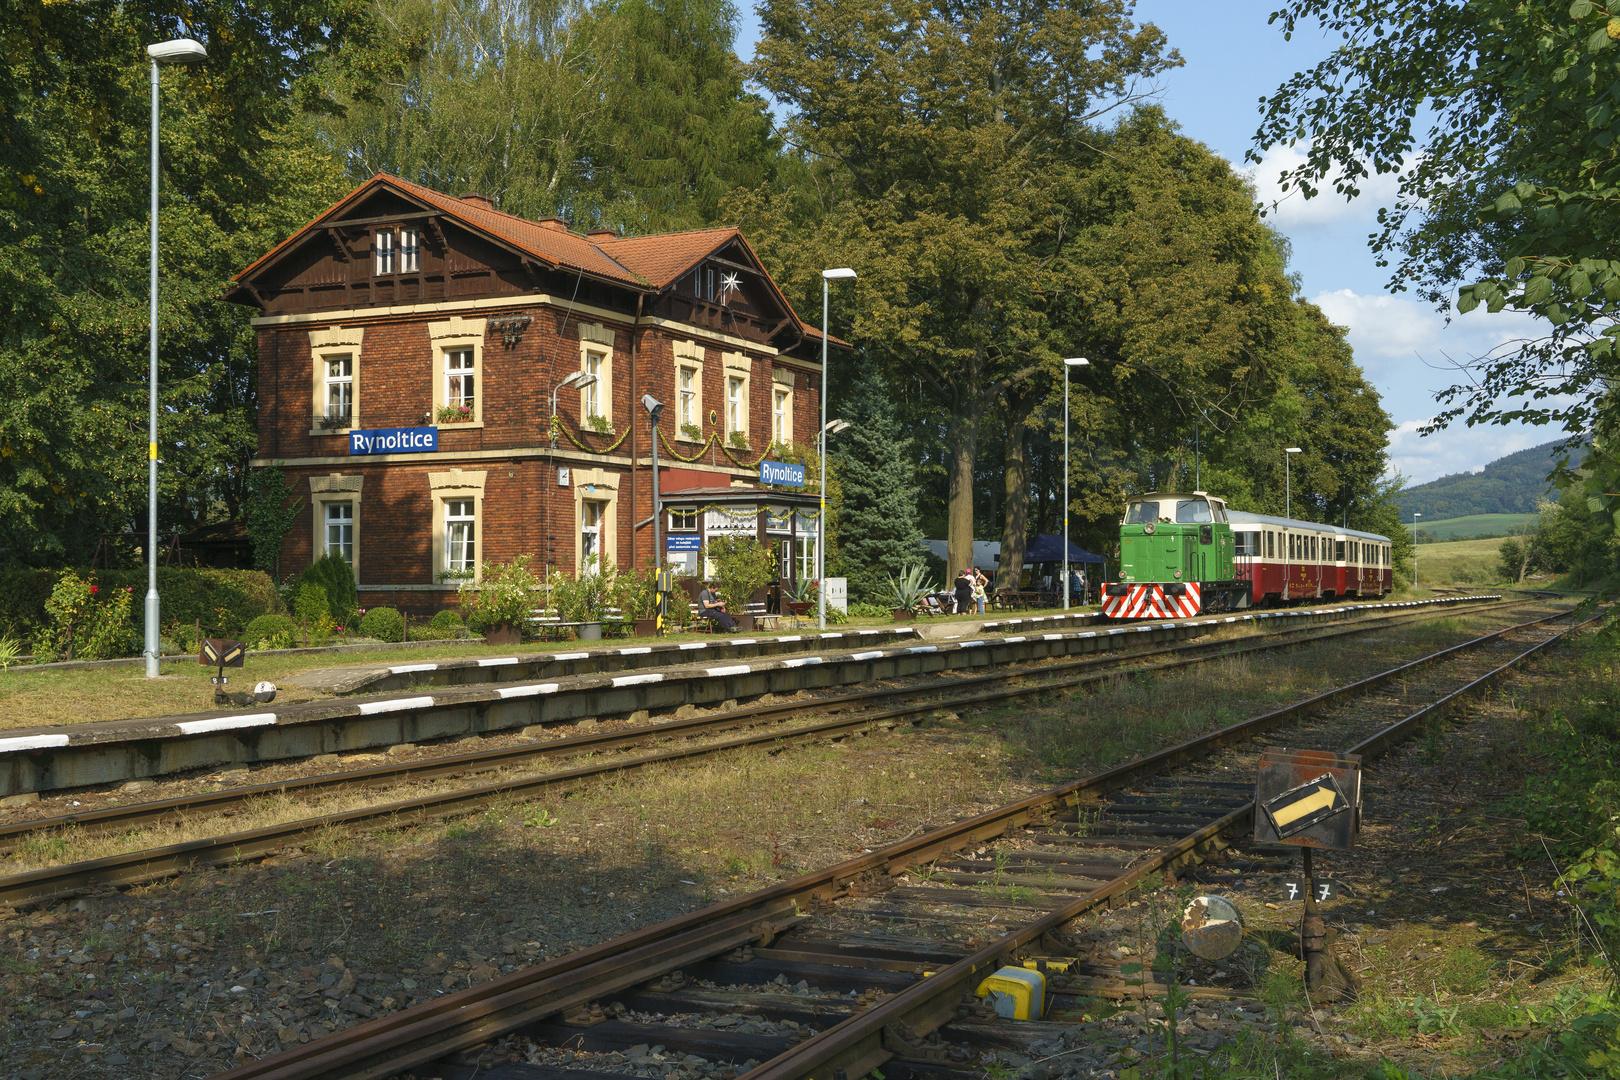 Bahnhofsfest in Rynoltice